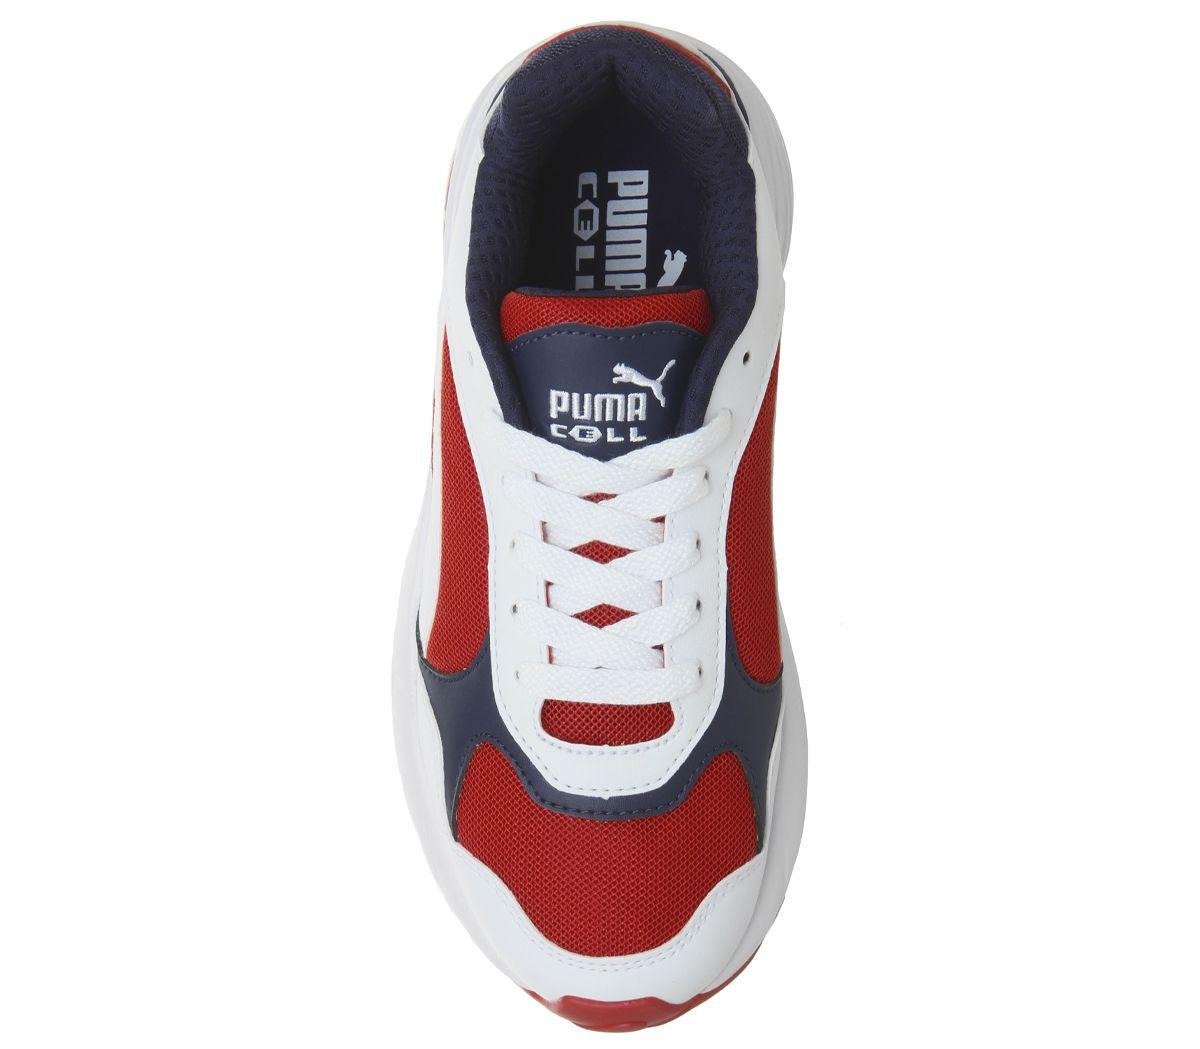 Homme-Puma-Cell-Viper-Baskets-PUMA-blanc-Risque-Eleve-Rouge-Baskets miniature 9